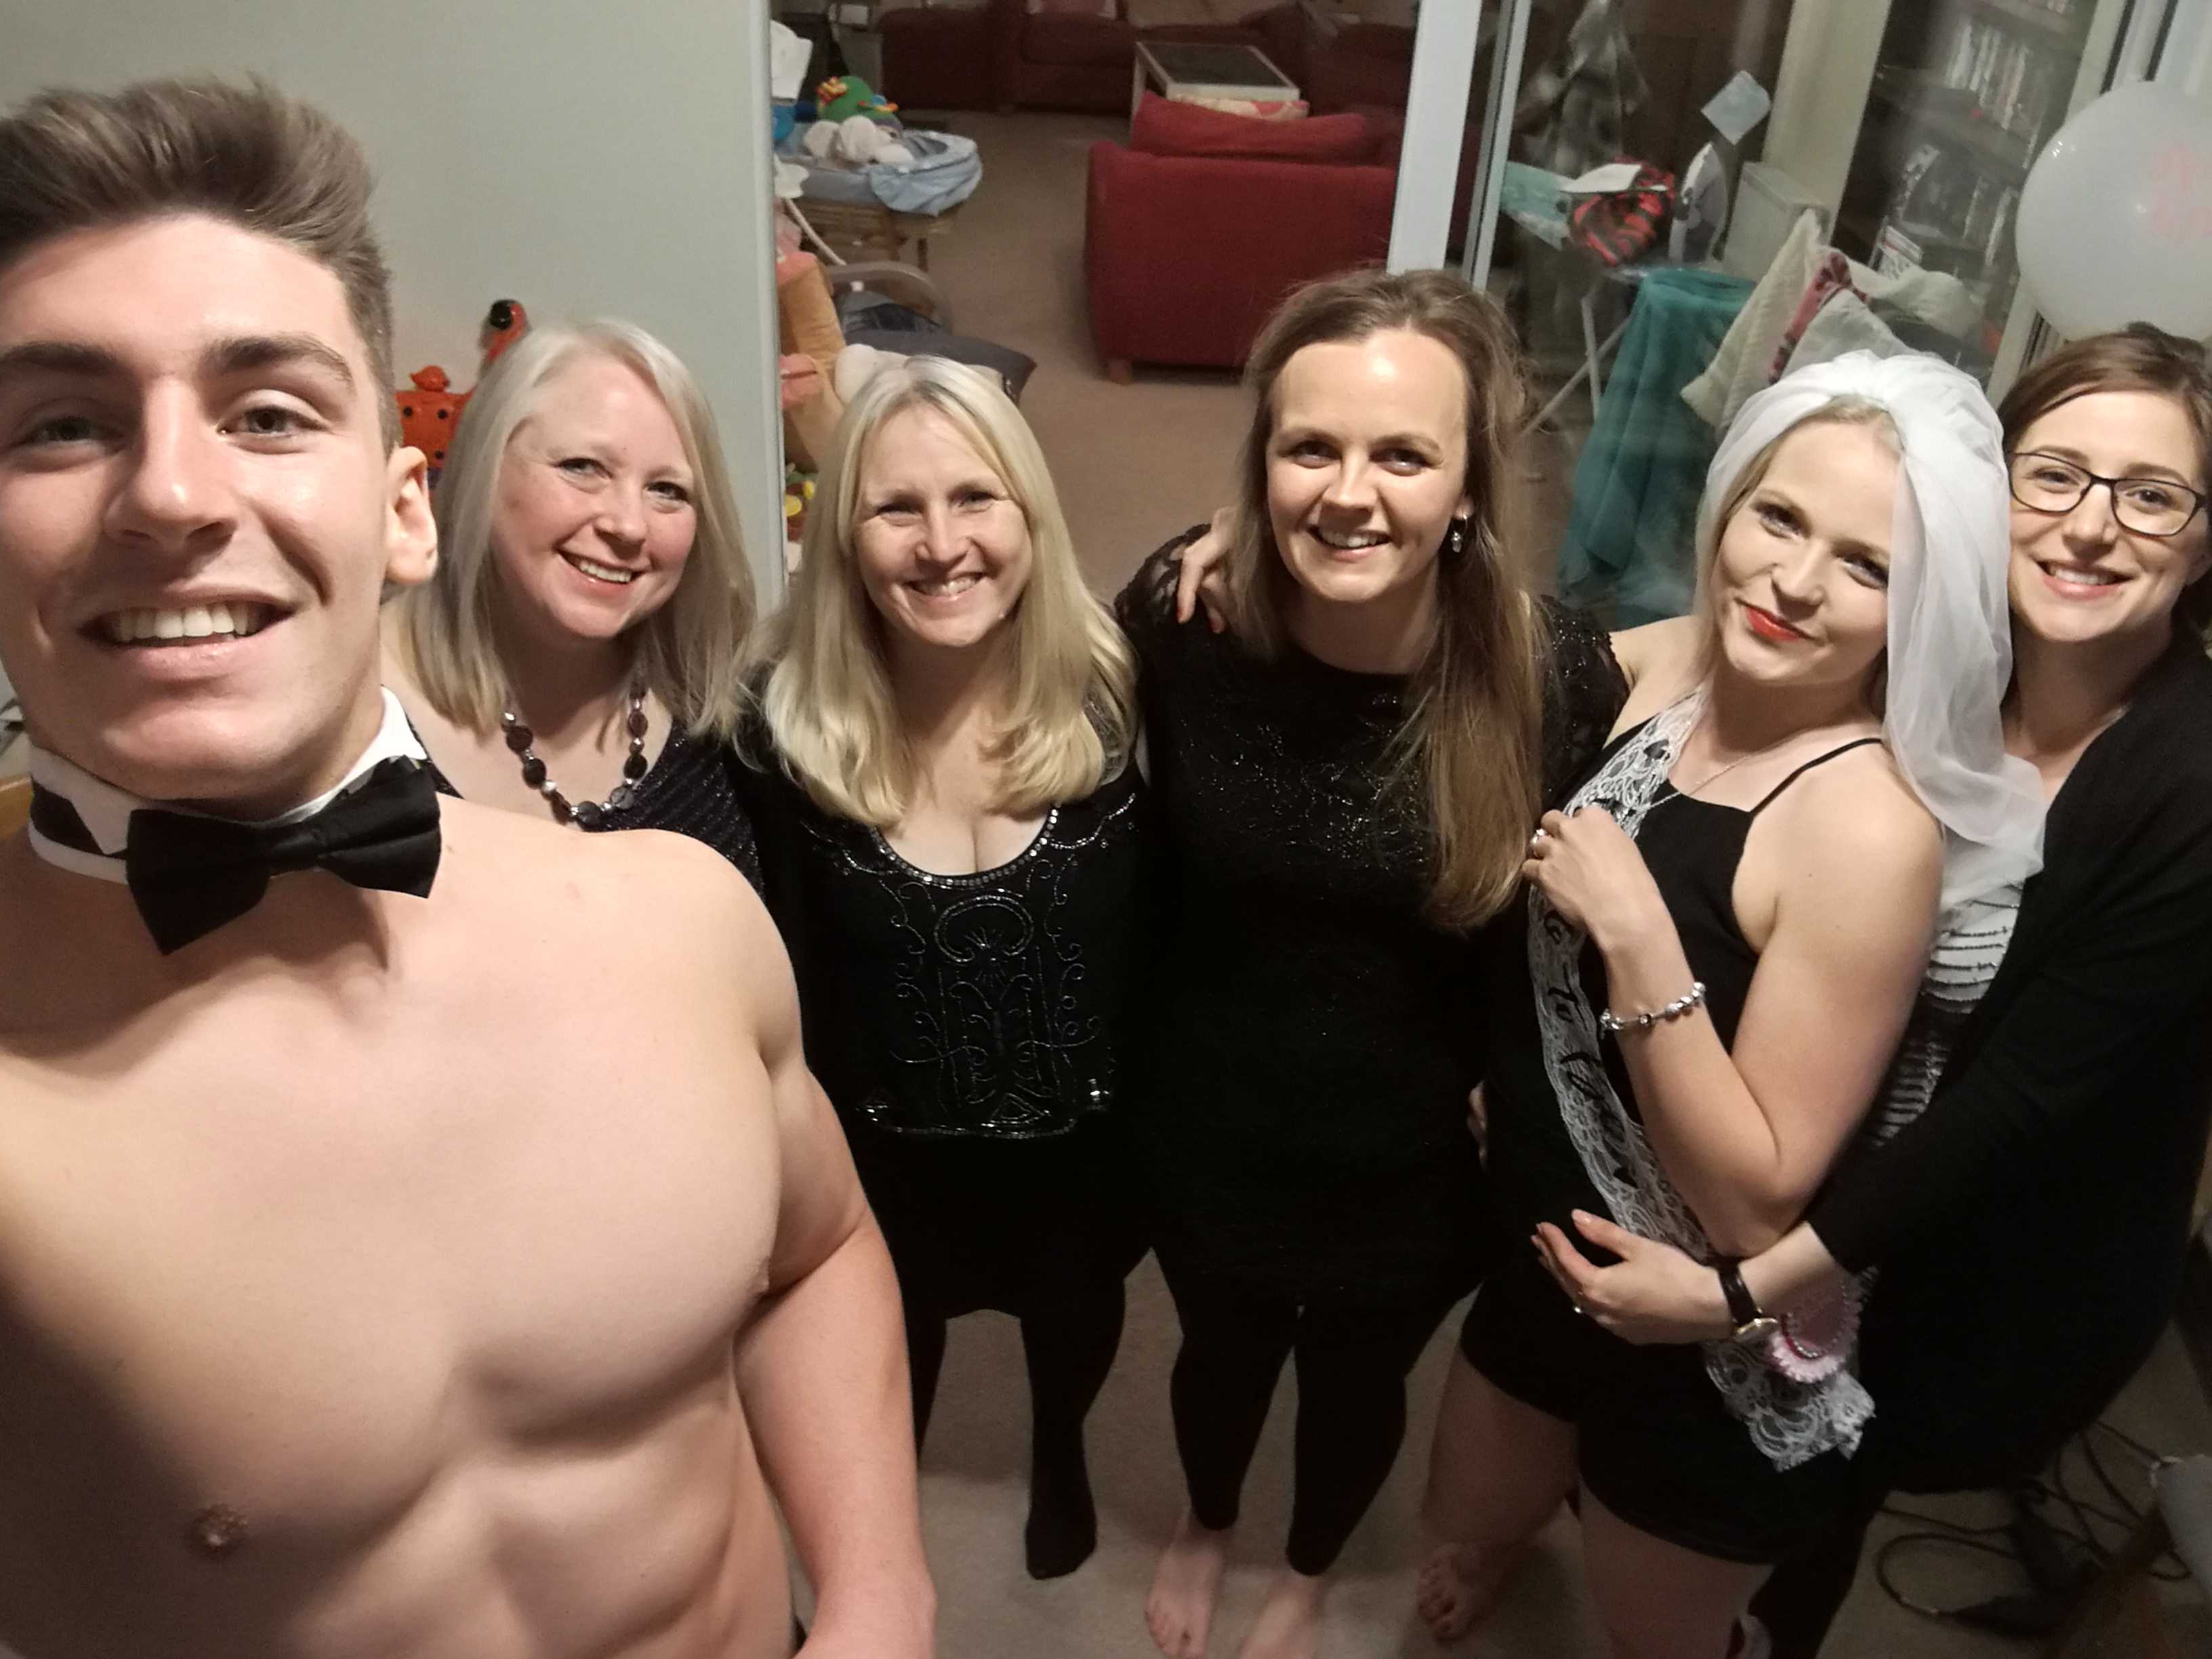 Butler in the buff group selfie